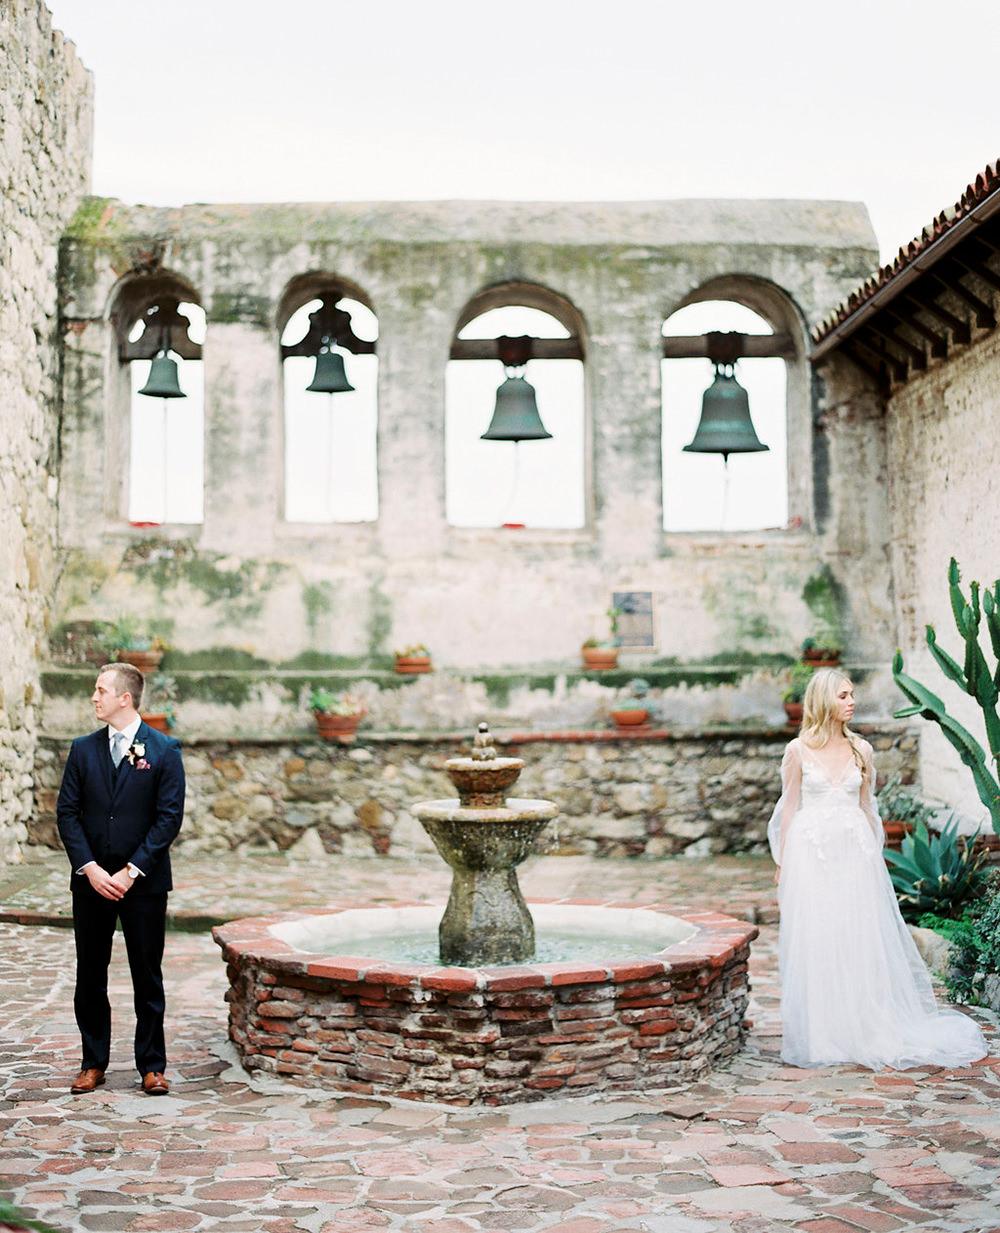 Relaxed San Juan Capistrano Wedding Inspiration - photo by Amanda Lenhardt http://ruffledblog.com/relaxed-san-juan-capistrano-wedding-inspiration